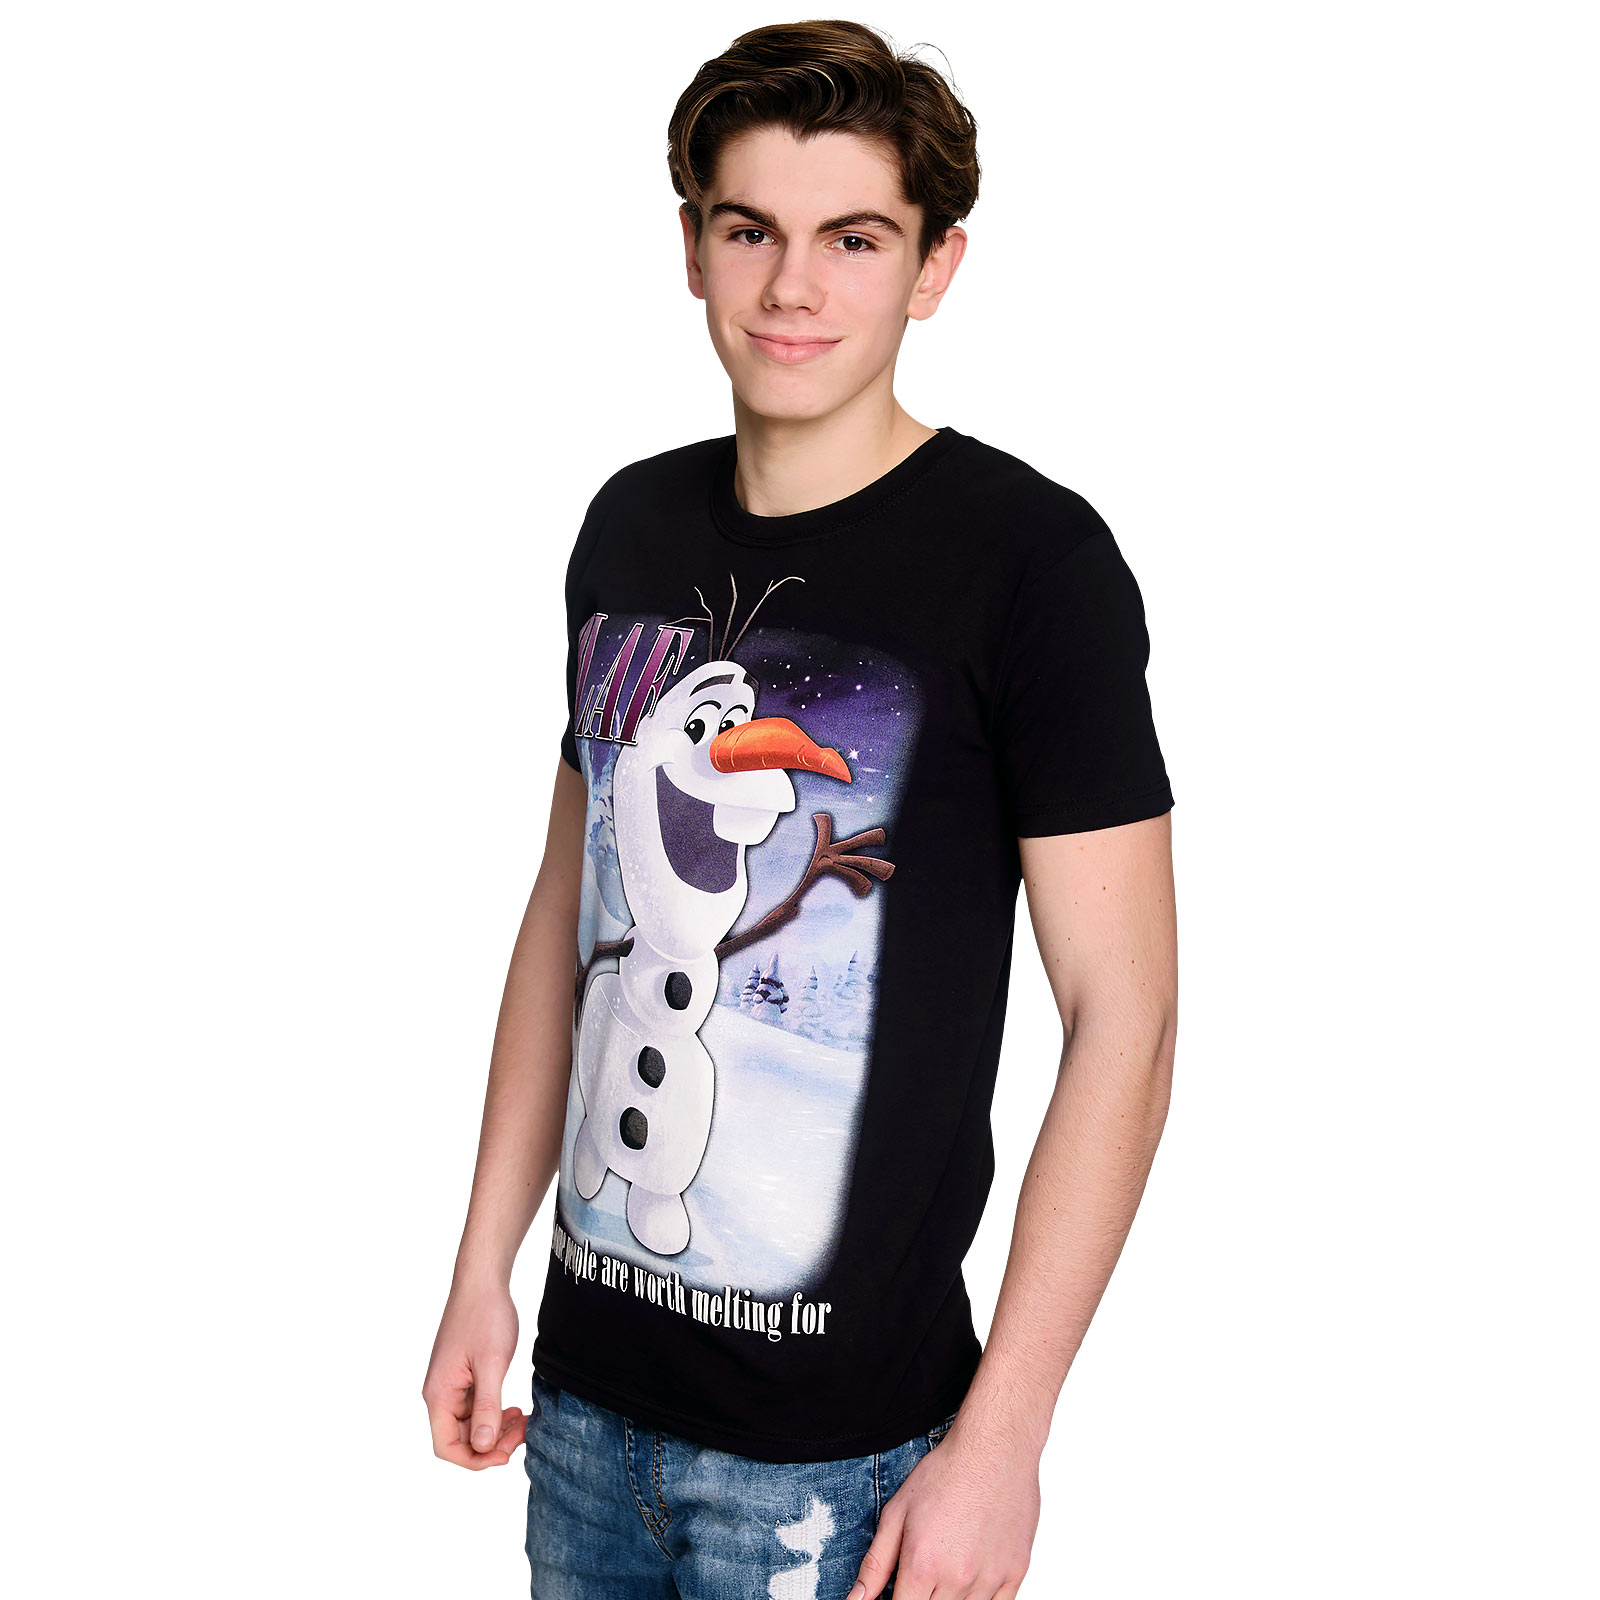 Frozen - Olaf Worth Melting For T-Shirt schwarz